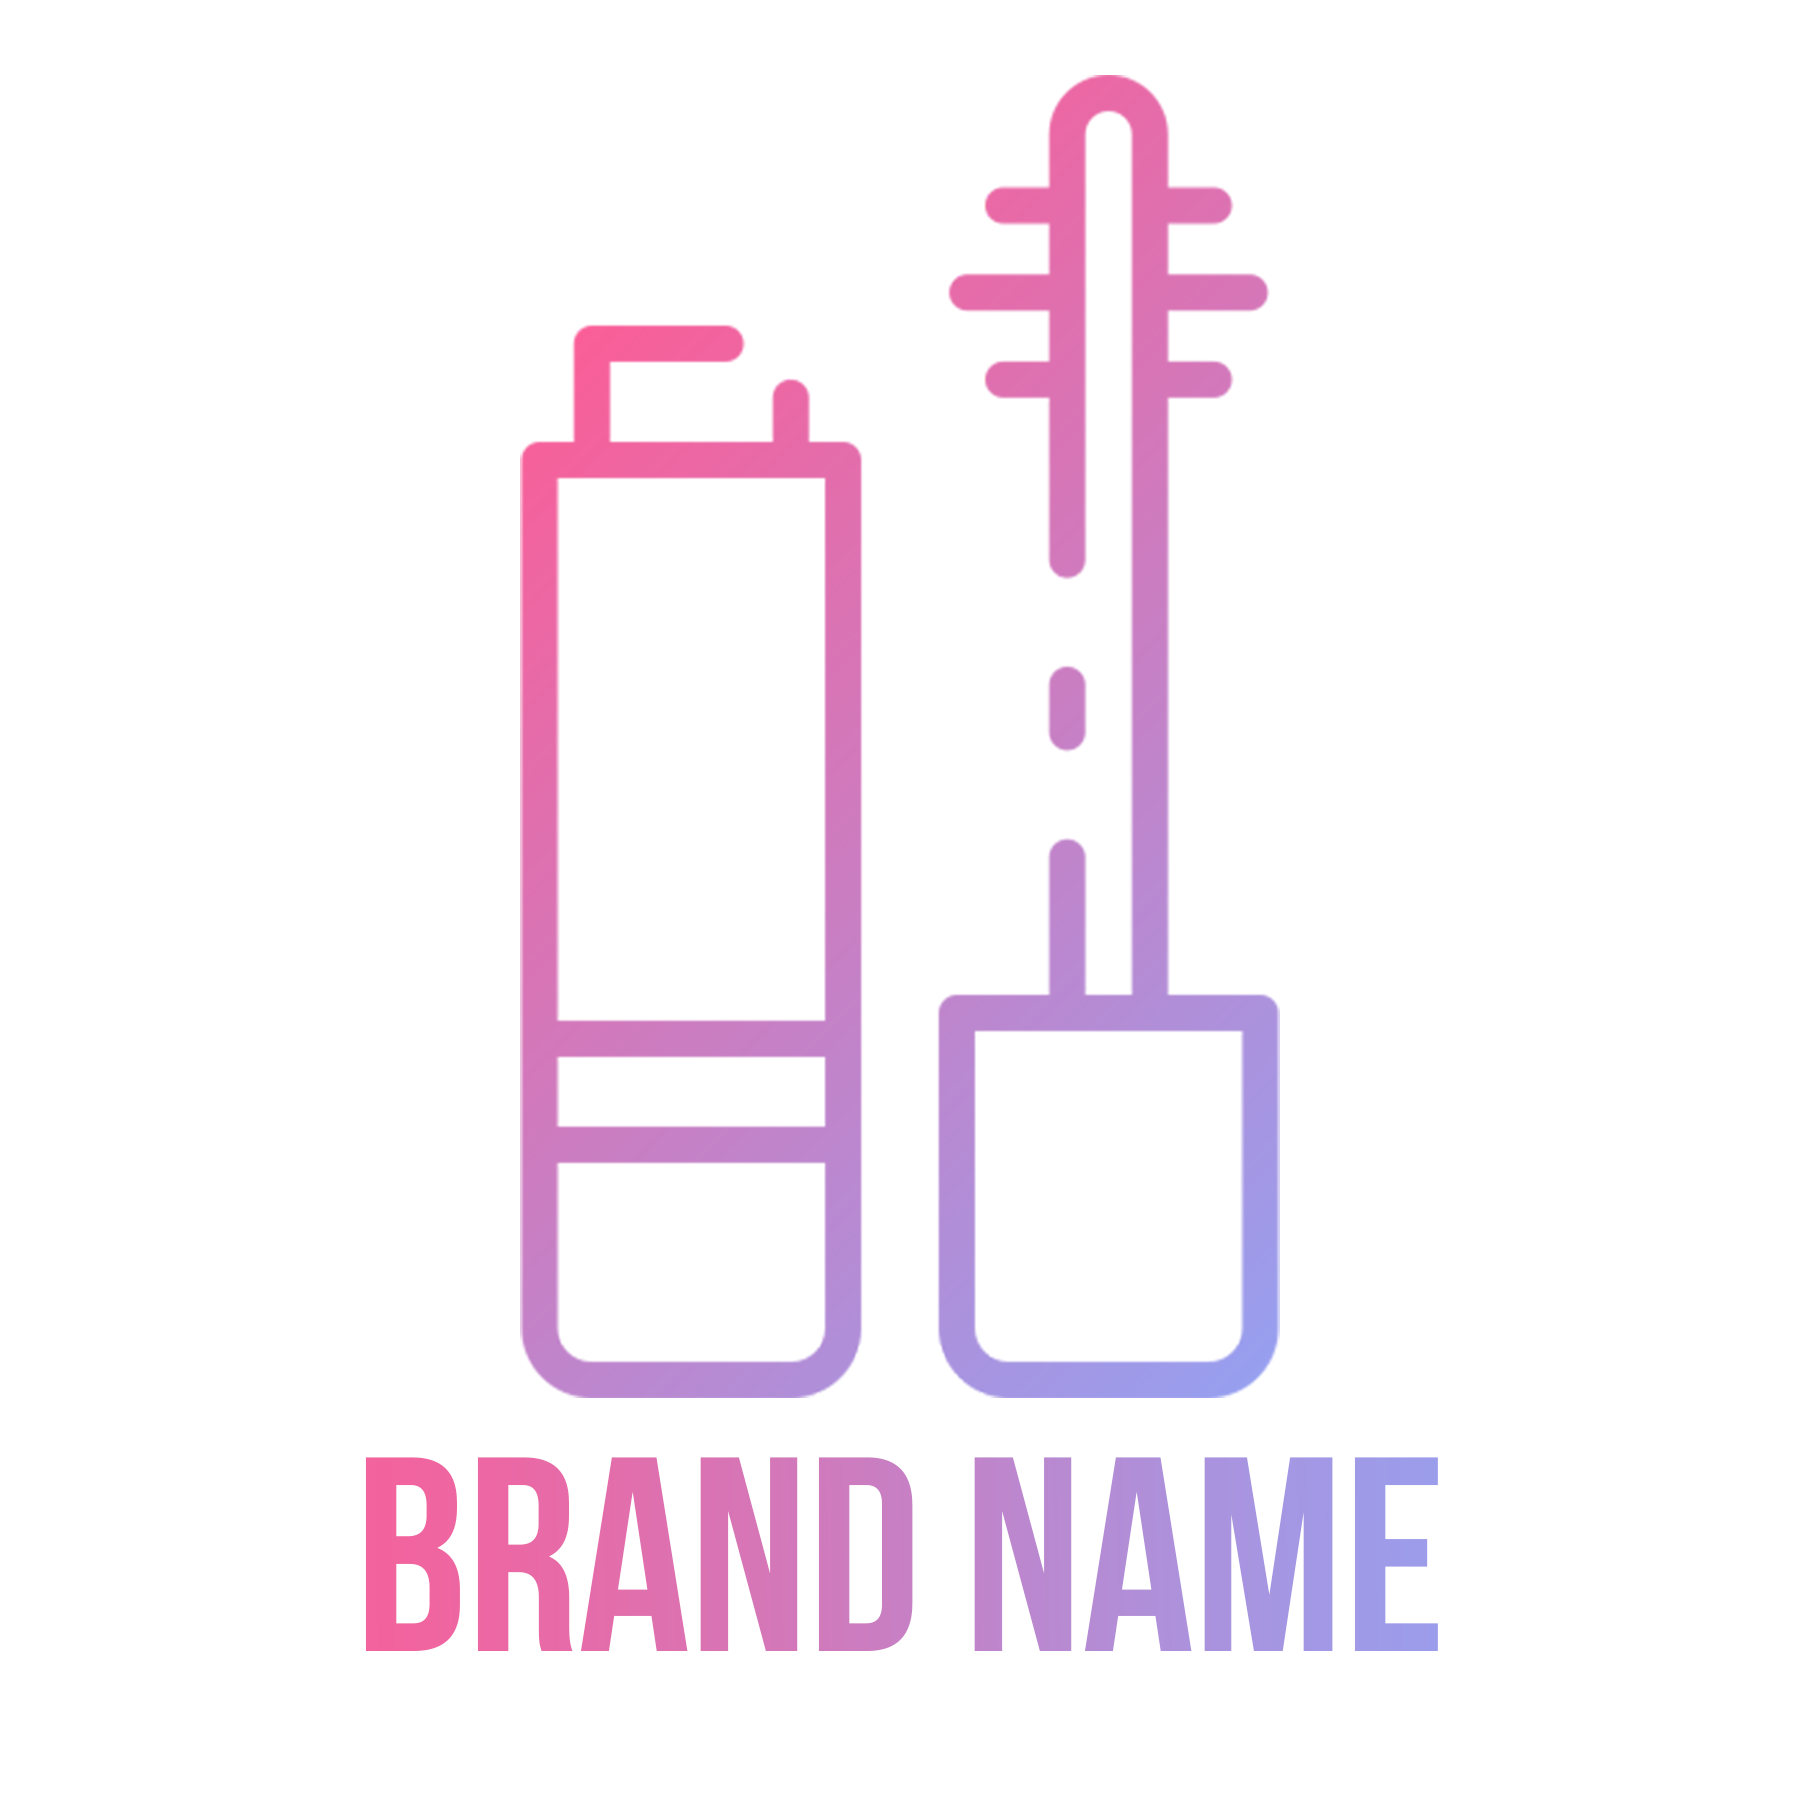 High Quality Cute LOGO Design for your brand